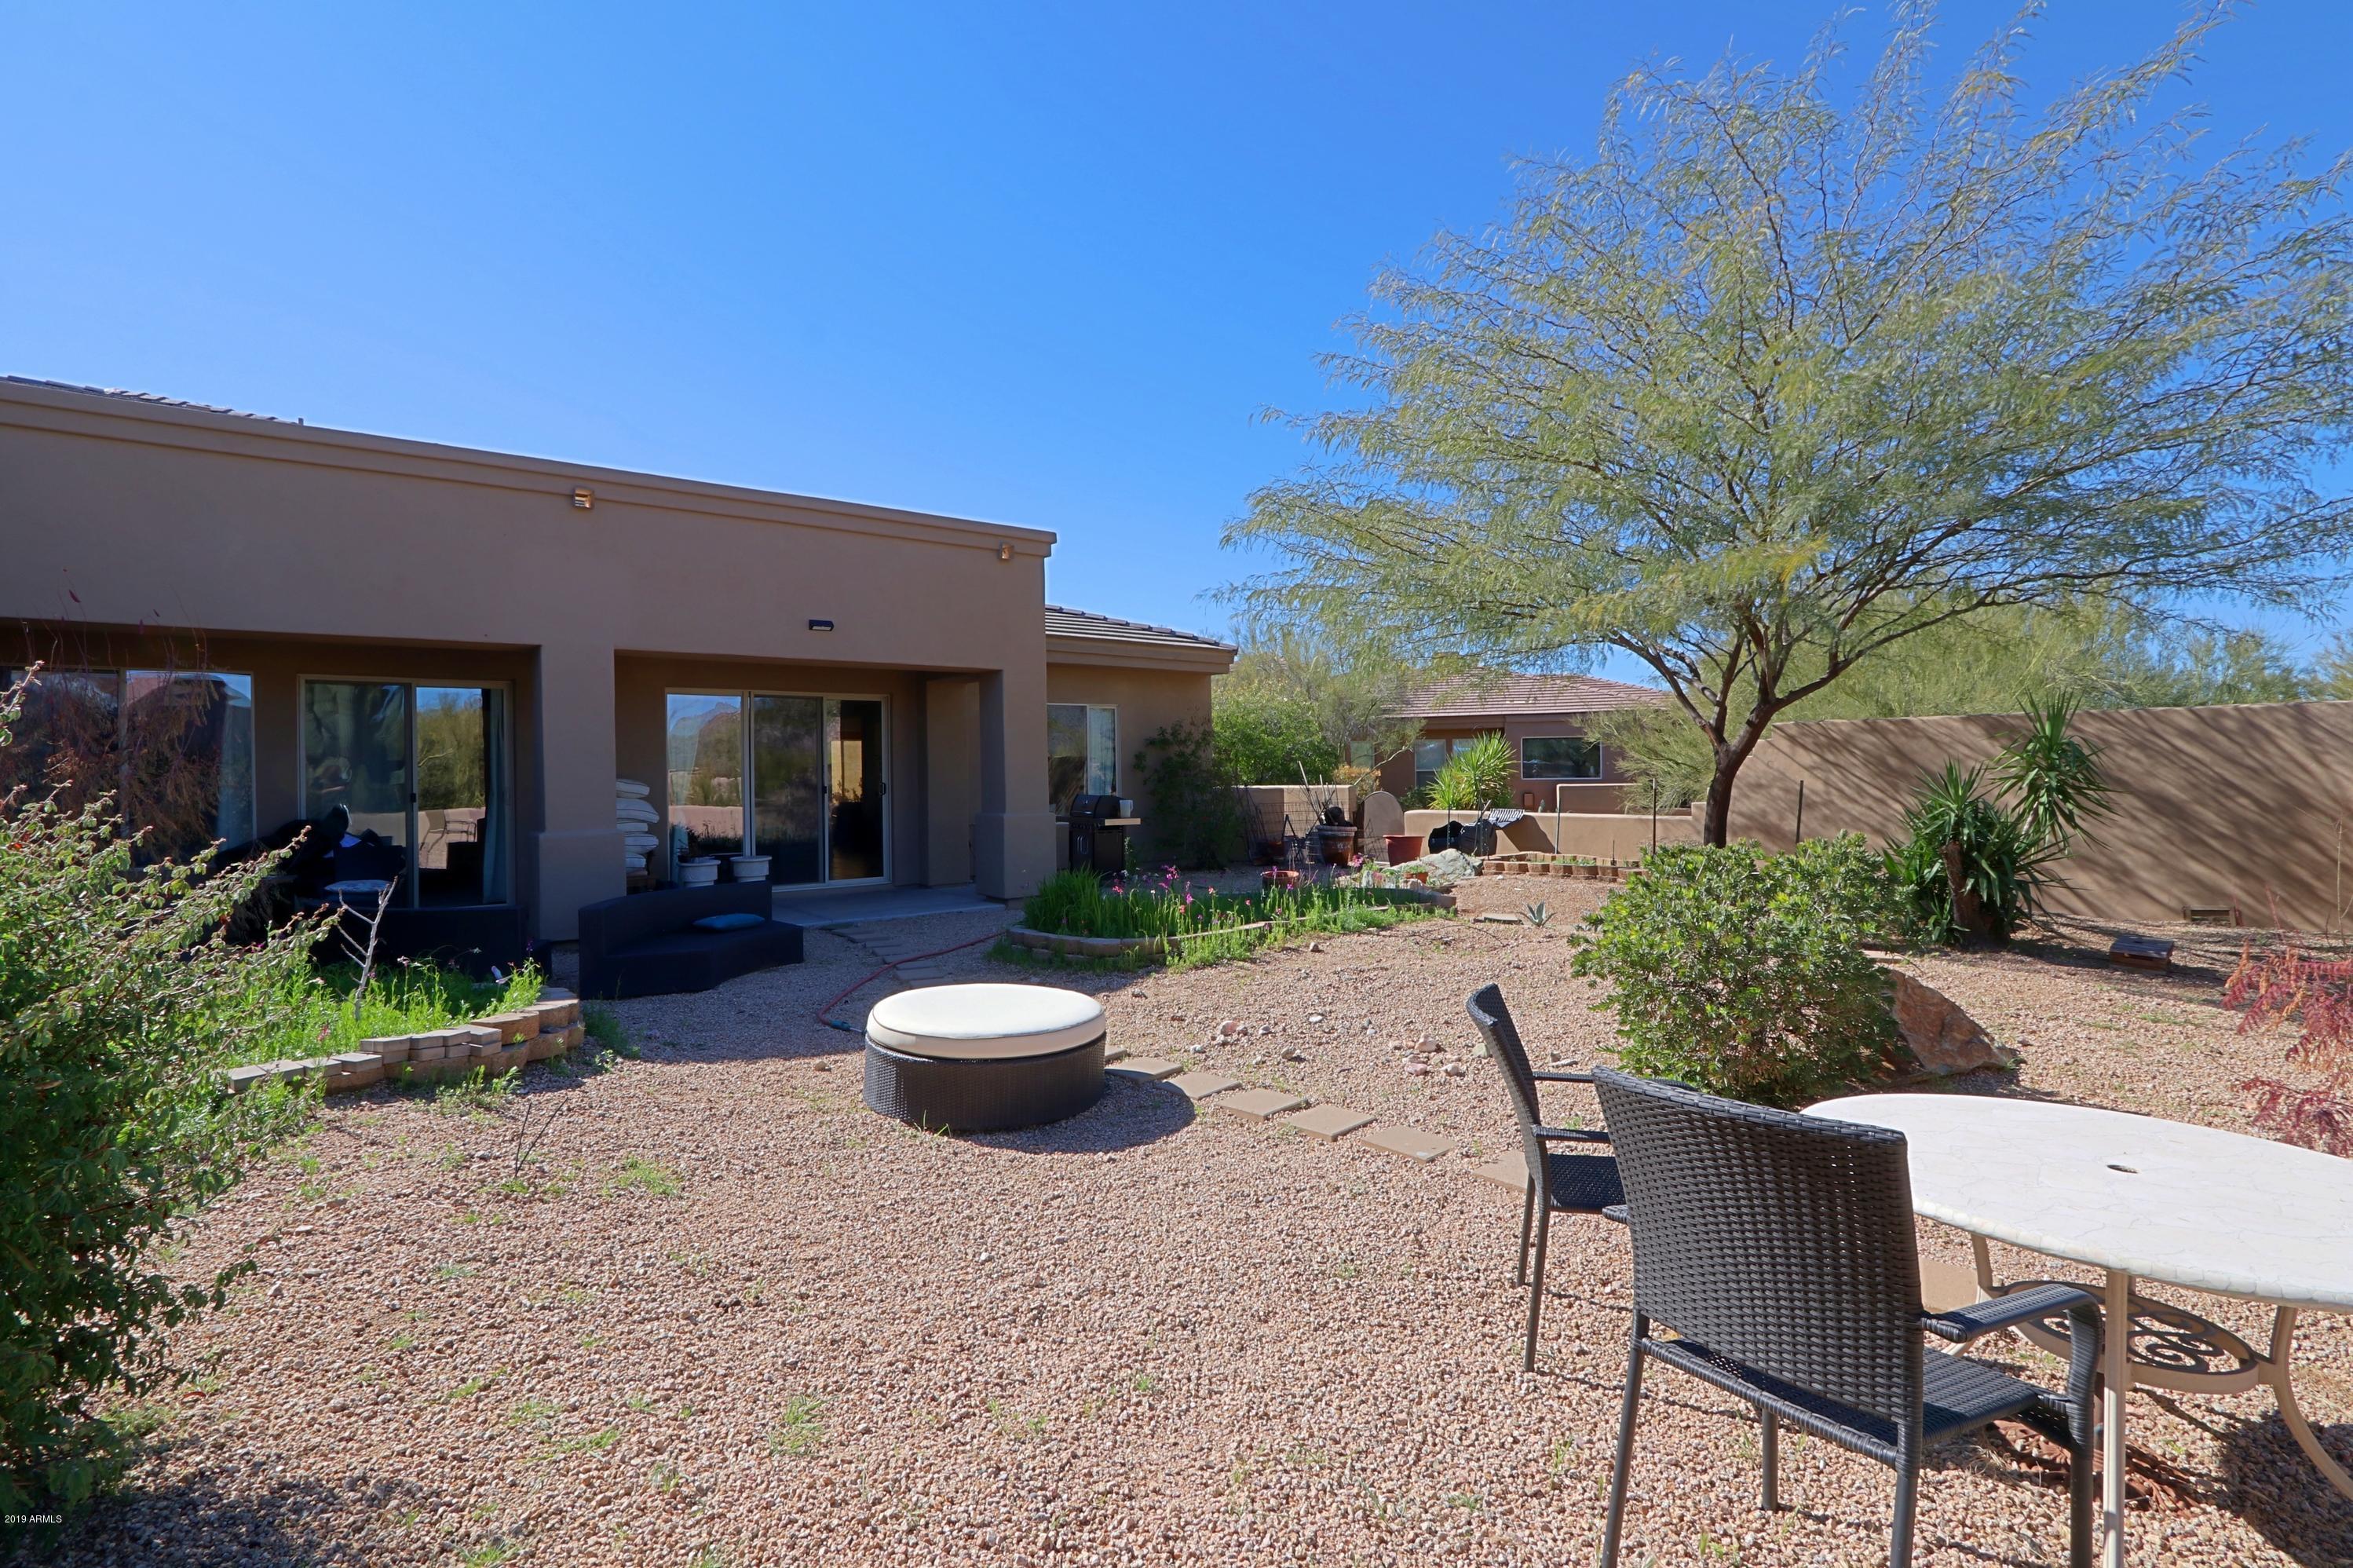 MLS 5964411 7244 E CRIMSON SKY Trail Building 33500, Scottsdale, AZ 85266 Scottsdale AZ Winfield